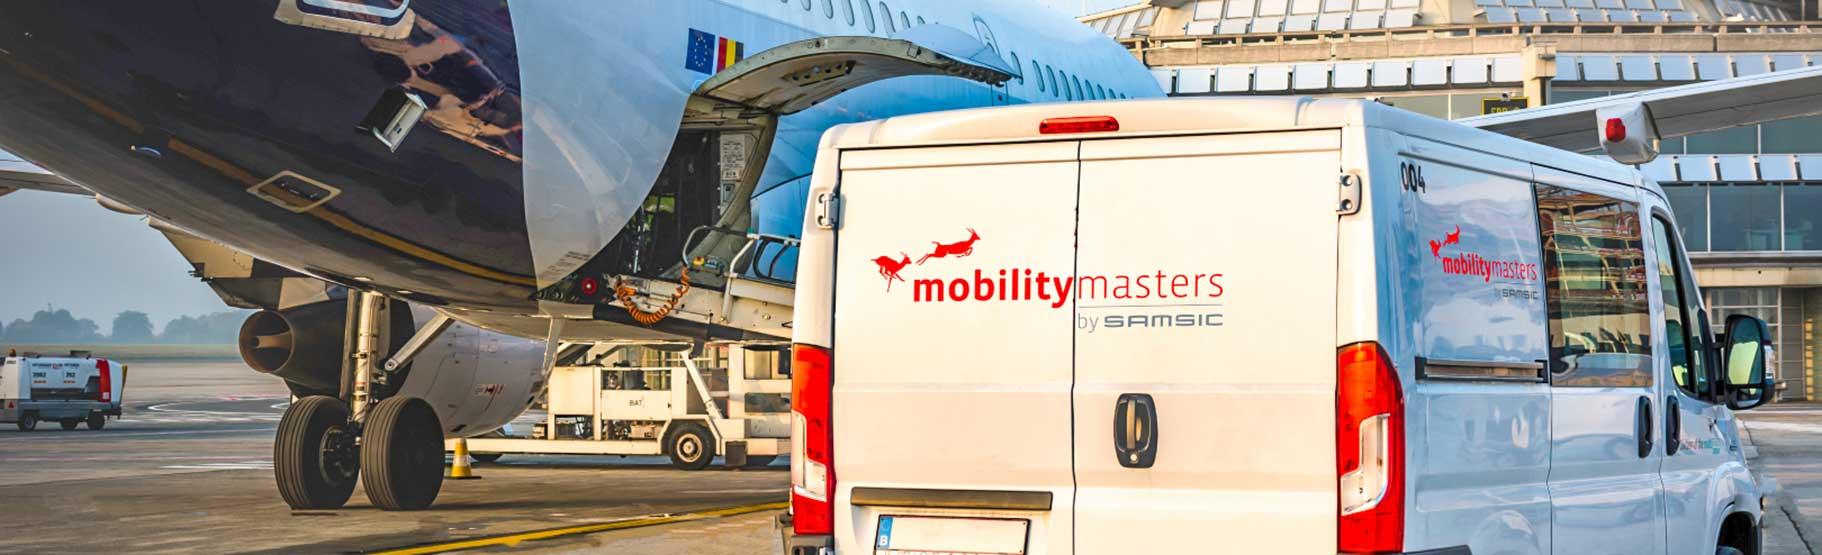 Vliegtuigen - Mobility Masters